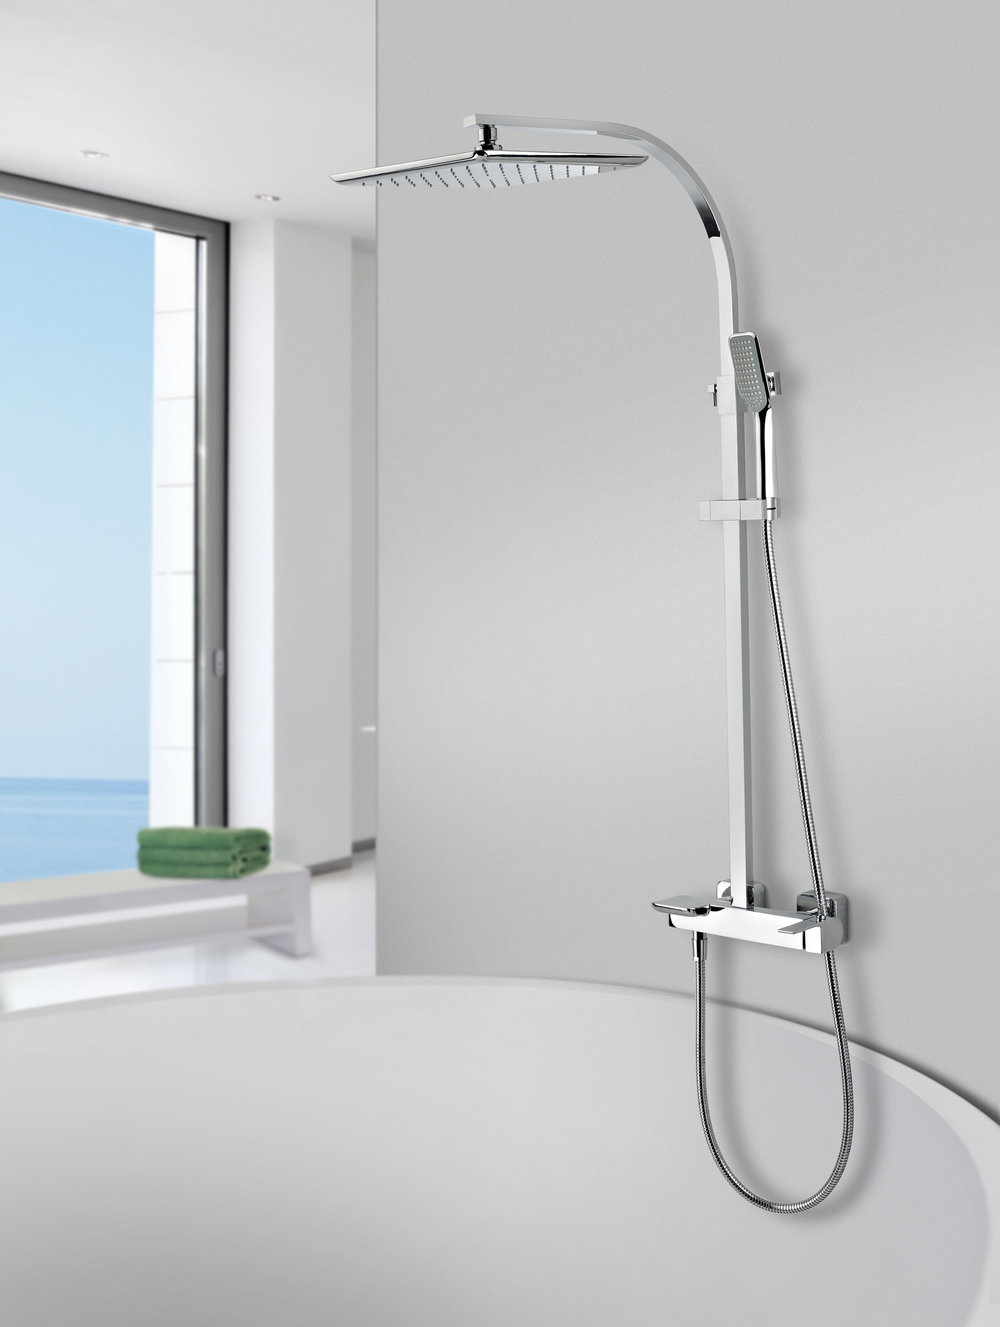 Teka Formentera Shower System